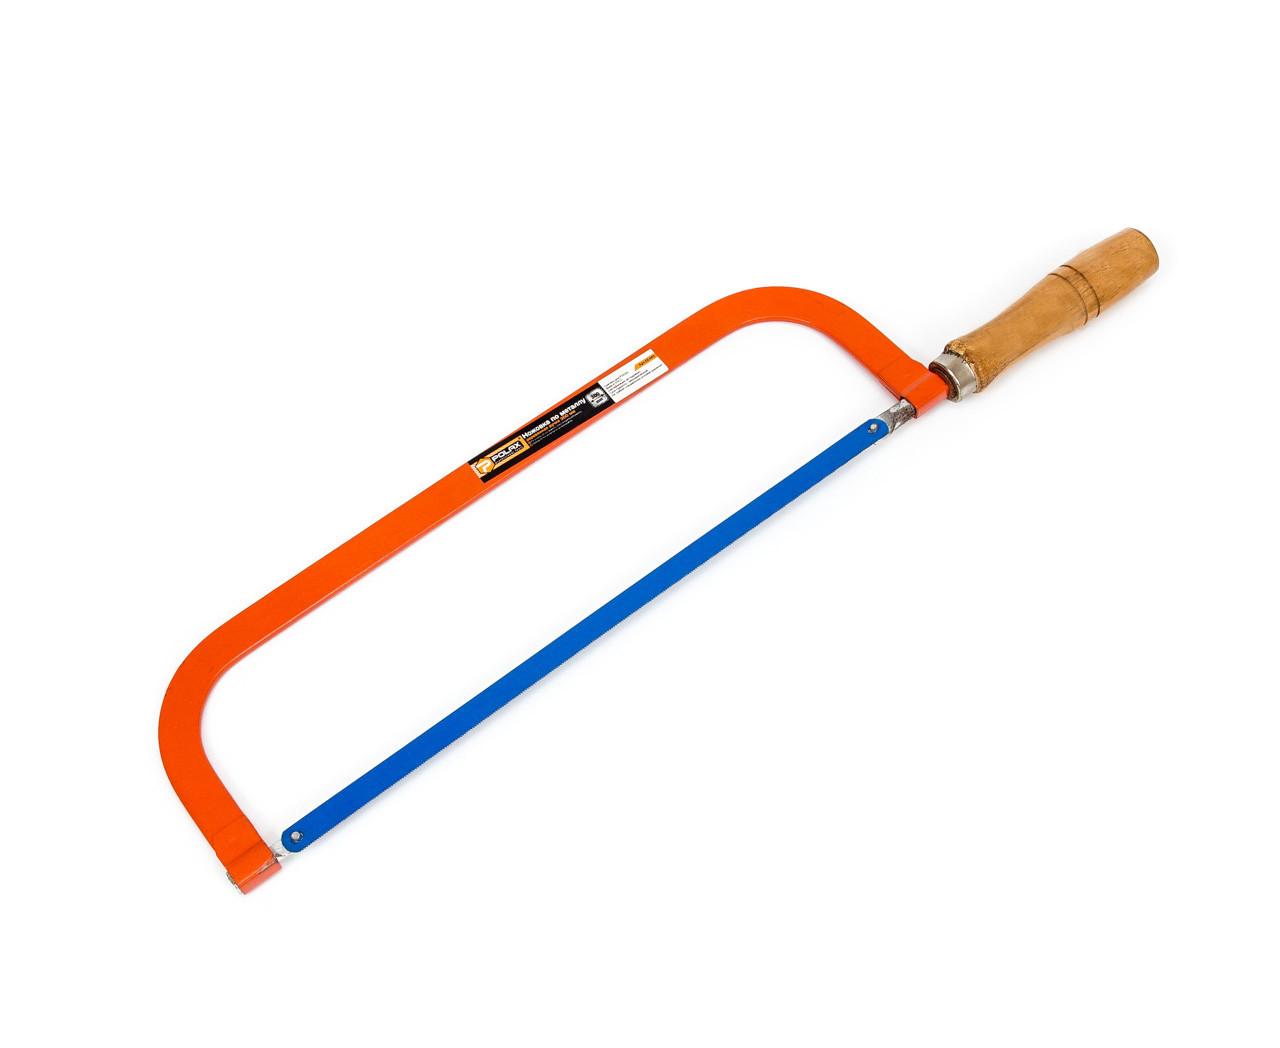 Ножовка по металлу Polax 300 мм (33-002) деревянная ручка